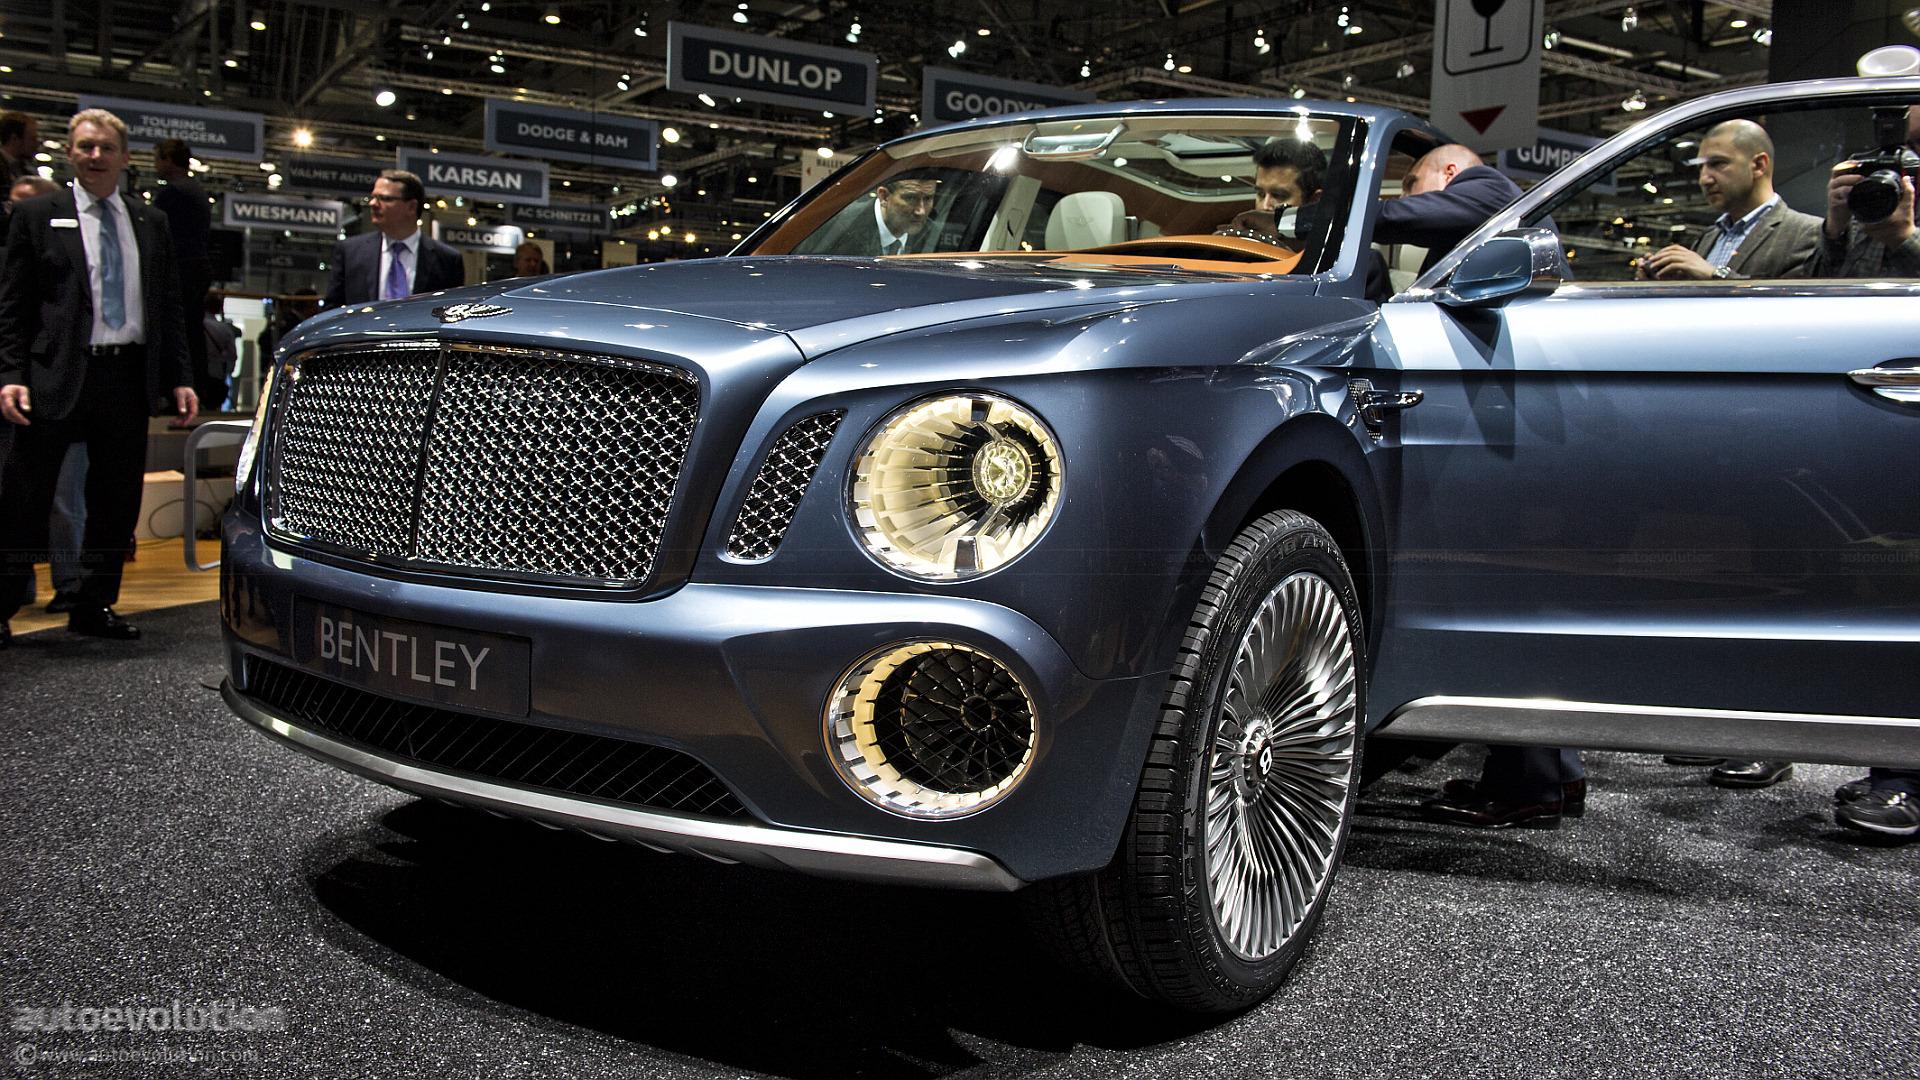 Geneva 2012 Bentley Exp 9 F Suv Concept Live Photos